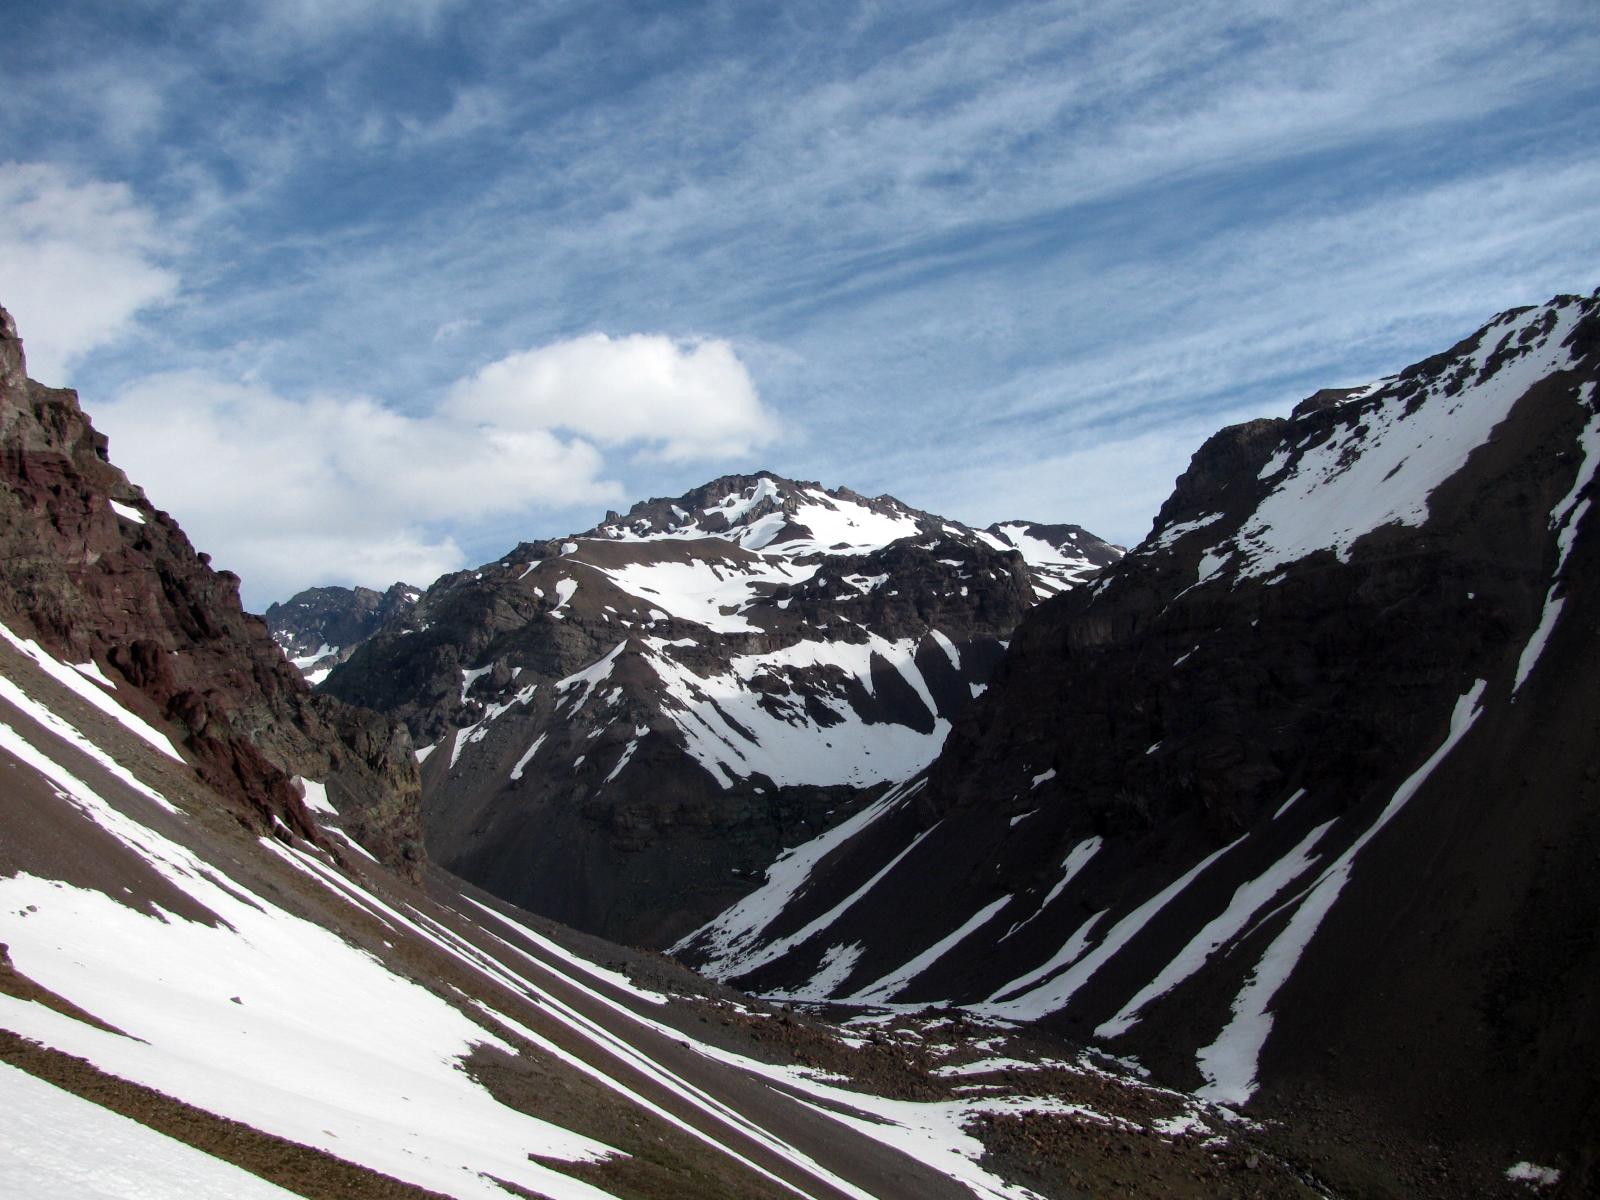 Cerro Manuel Rodríguez as seen from Cajón de Espinoza.